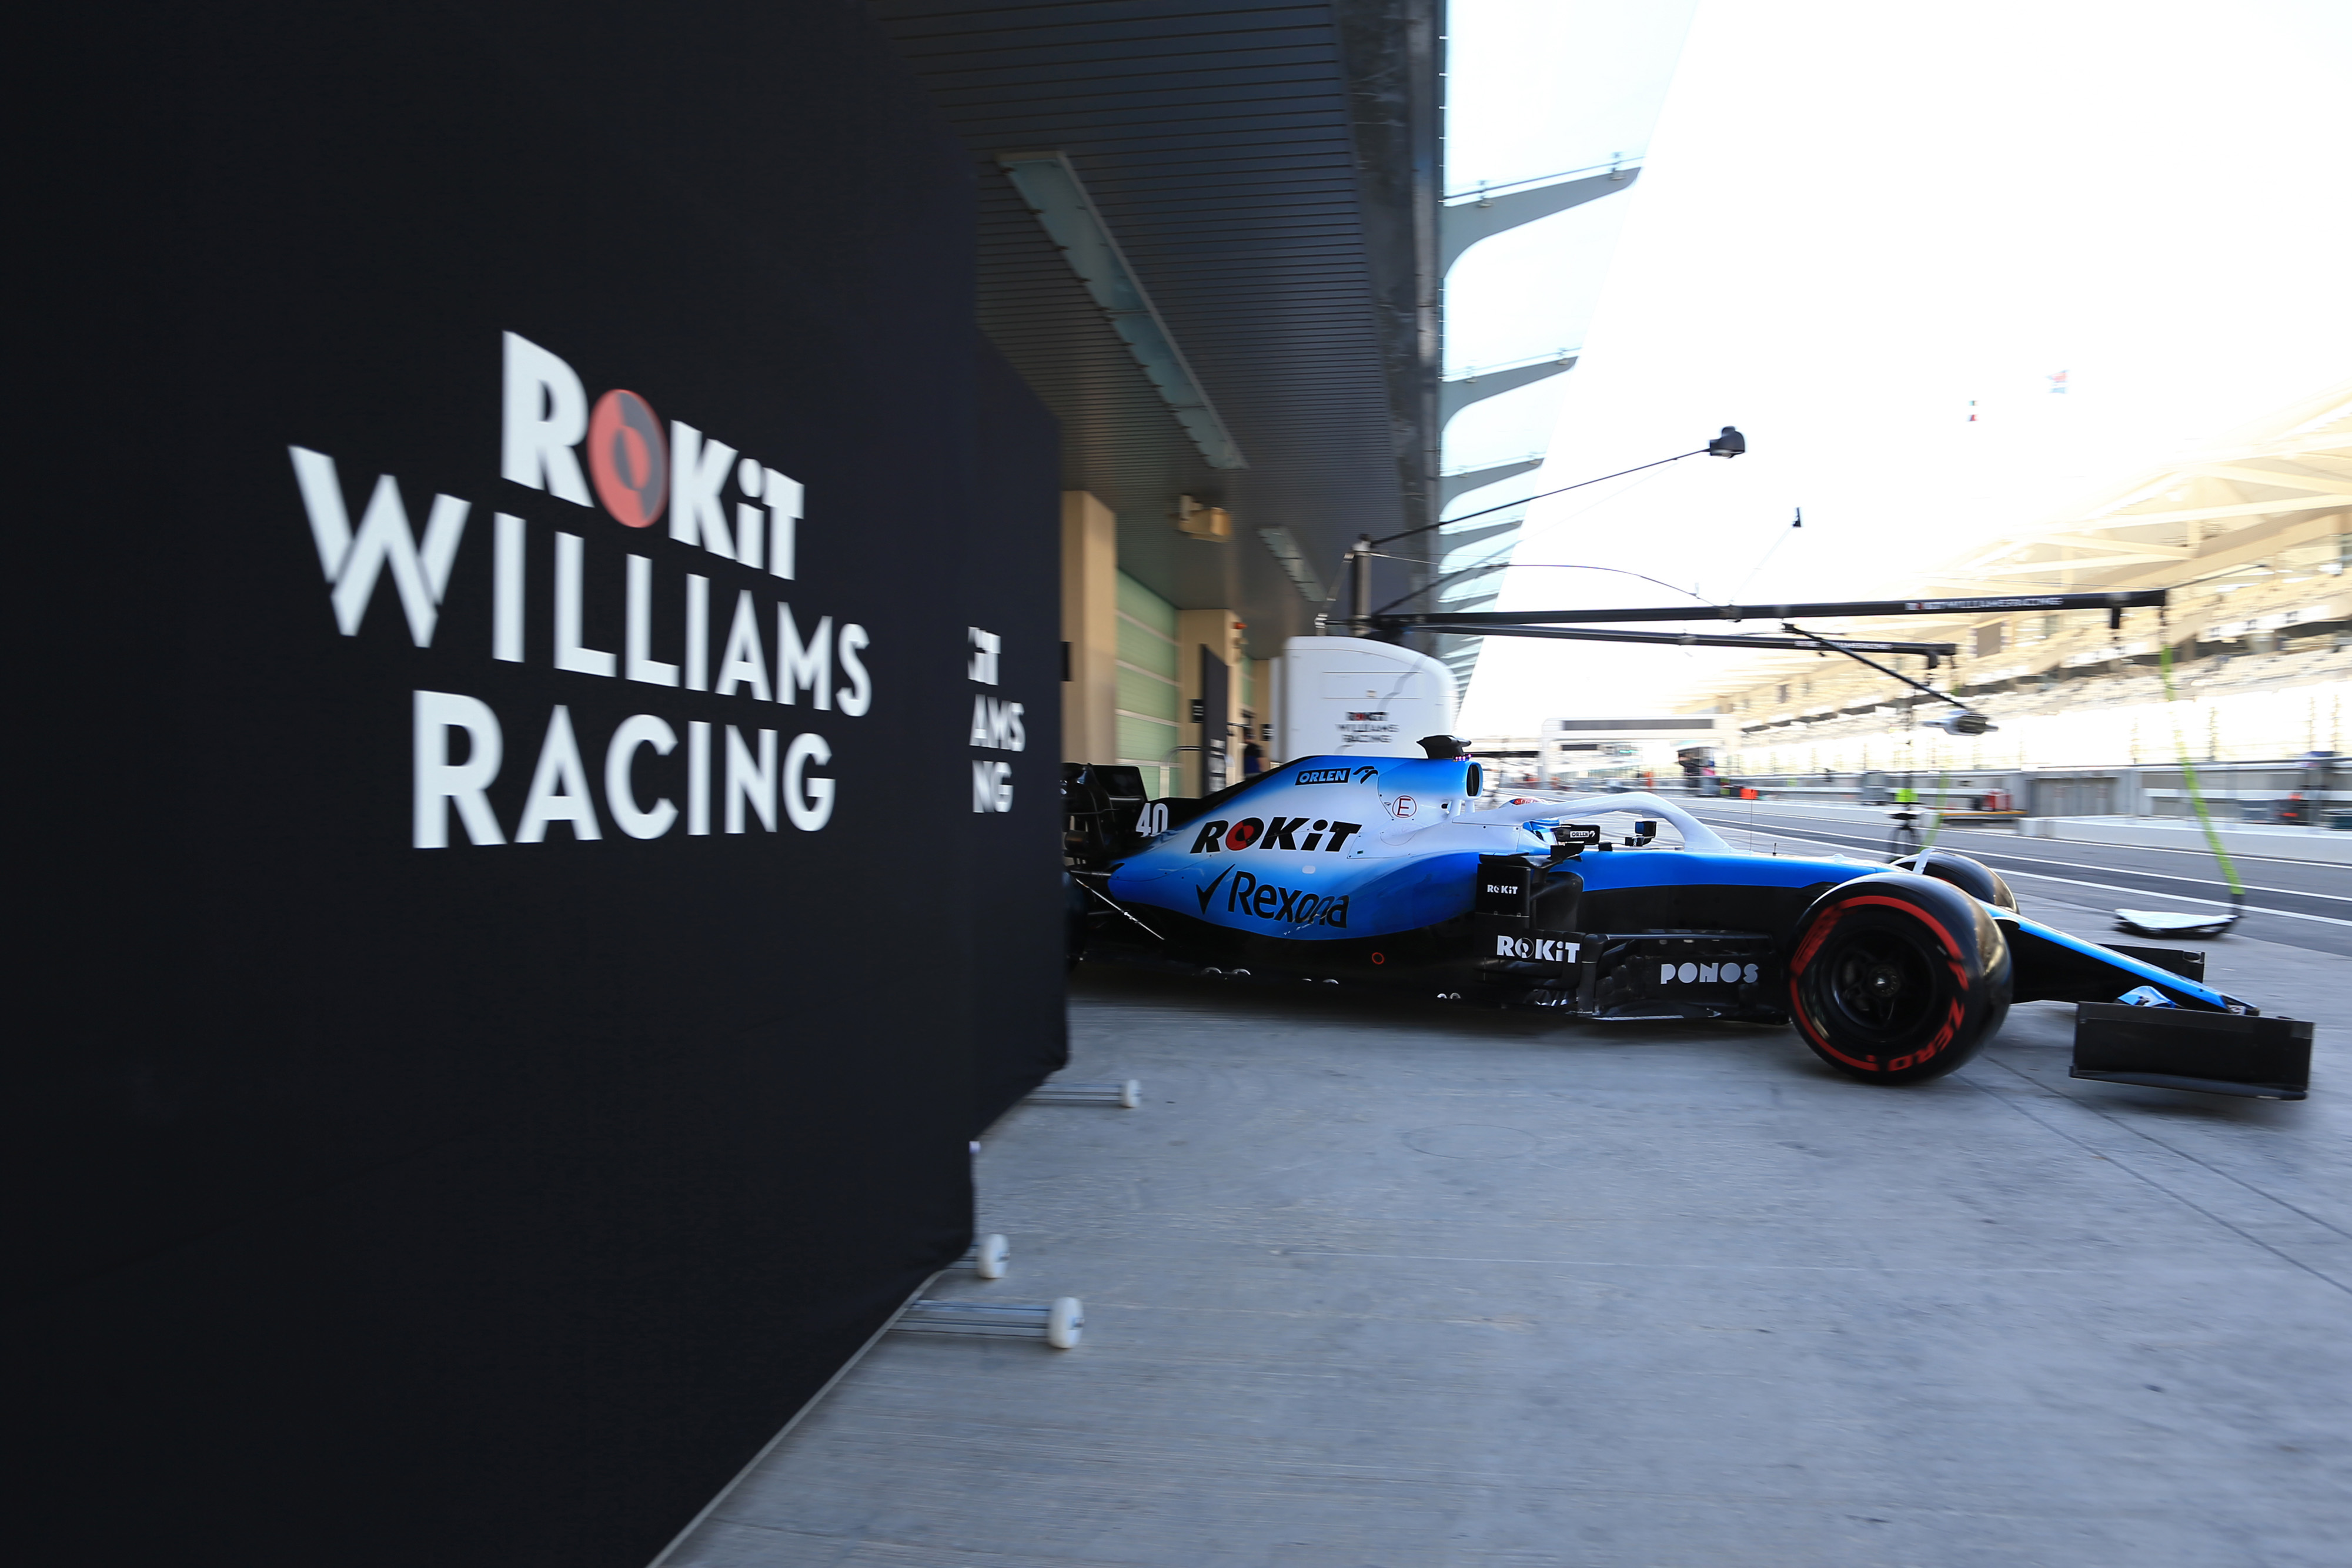 F1 Formula 1 Williams Lavazza Nicholas Latifi